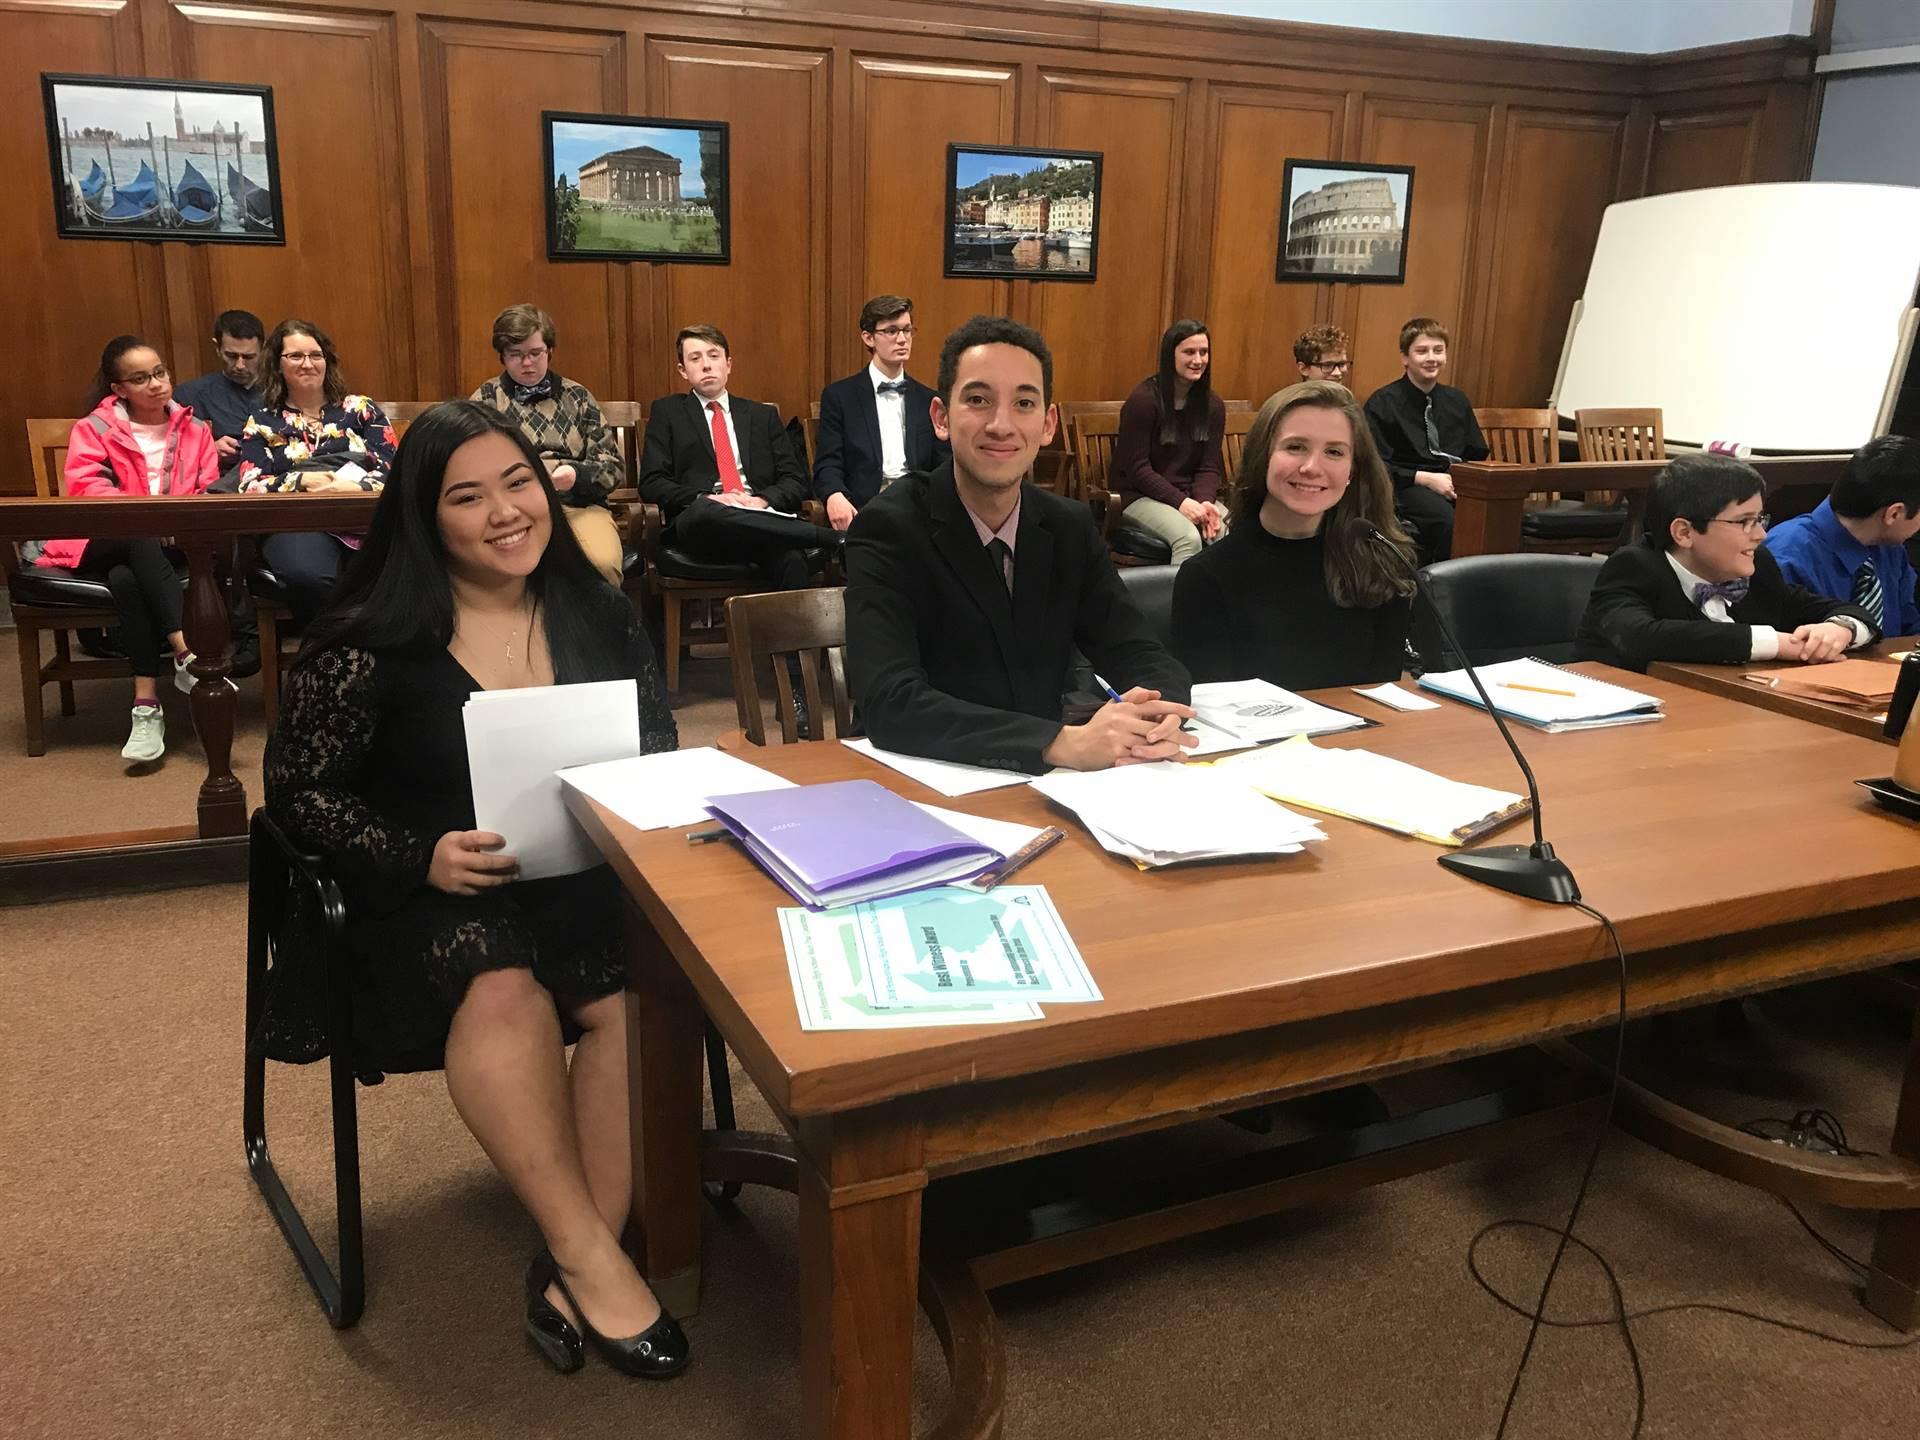 Mock trial team plaintiff attorneys